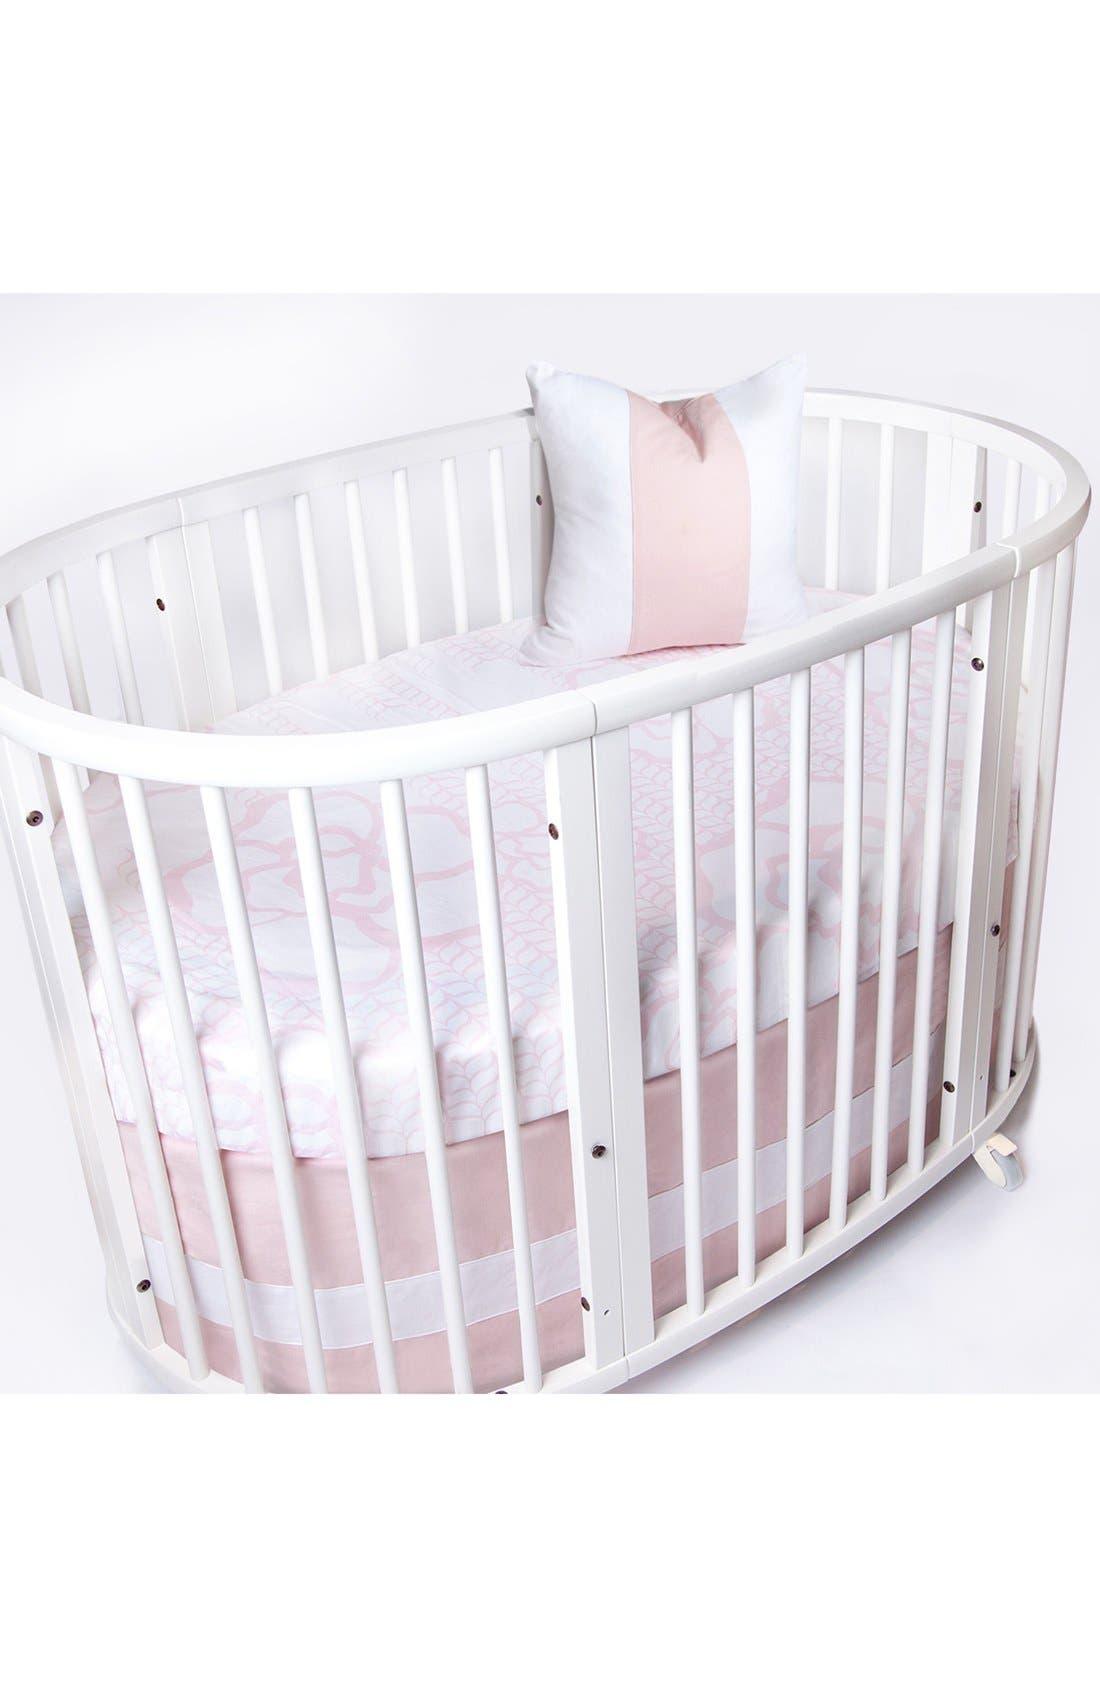 Oilo Woven Band Crib Skirt for Stokke Sleepi Crib